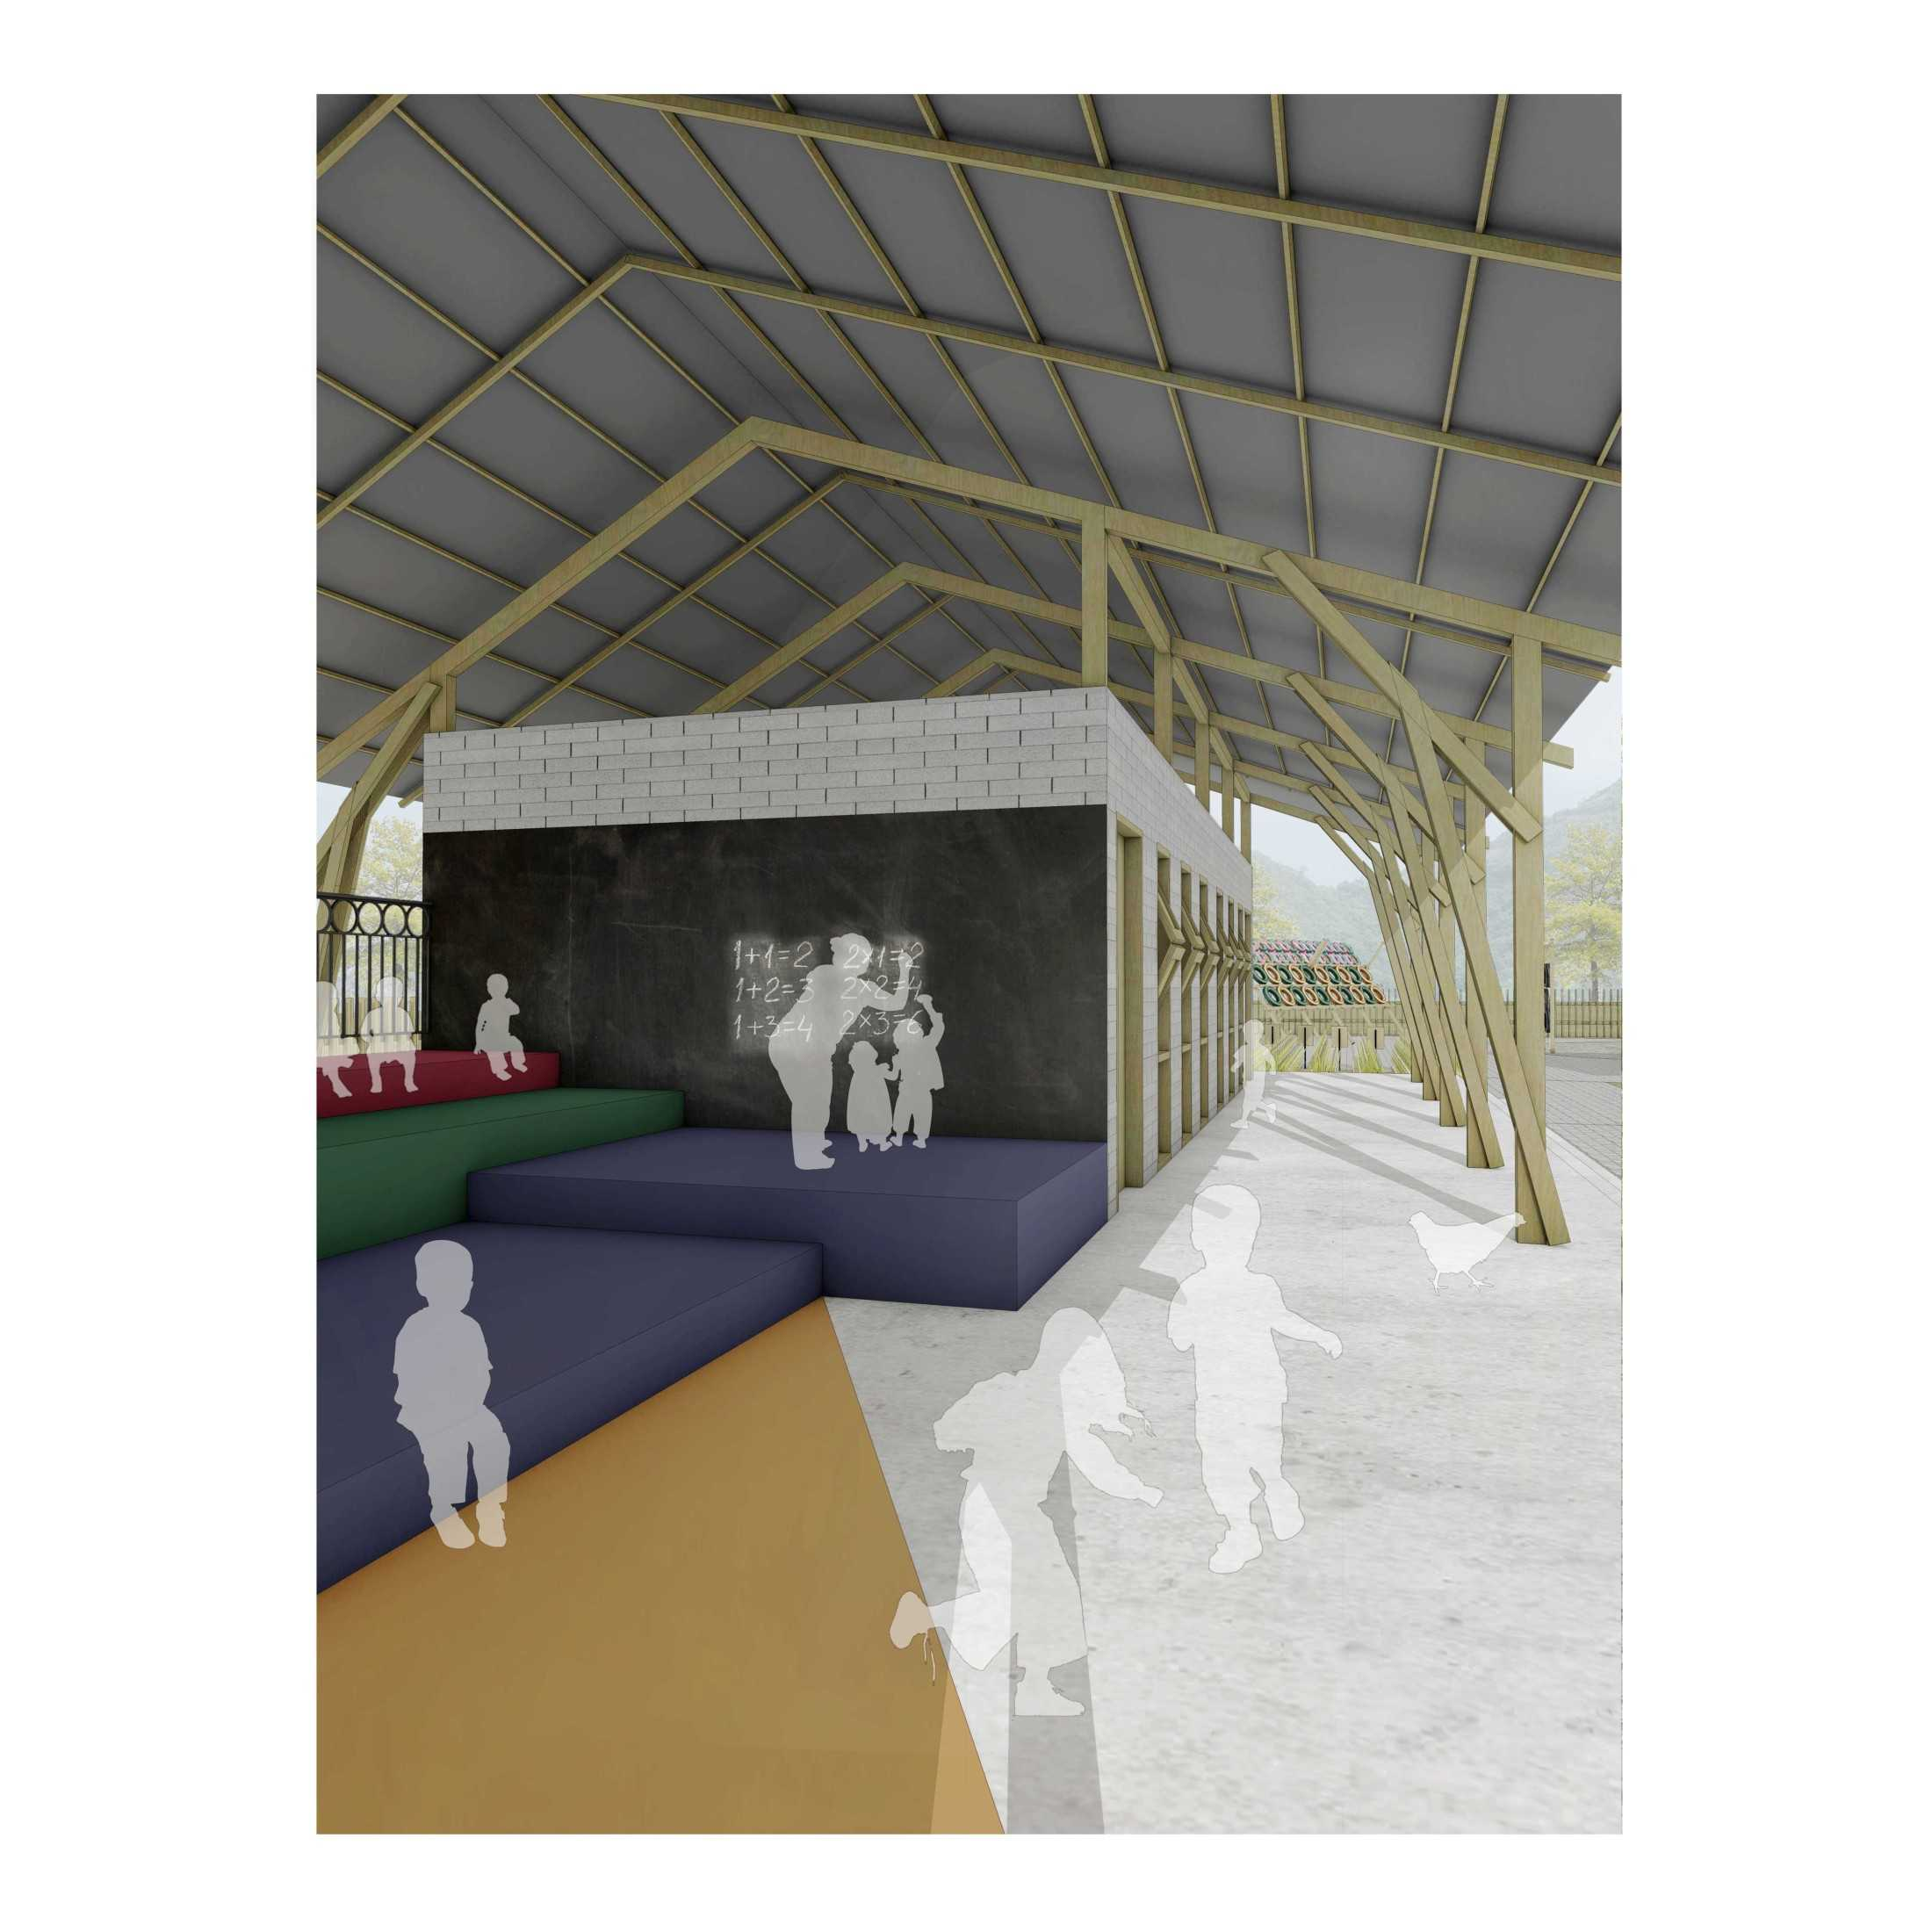 Studiogra/ph Architects Mentari School Kabupaten Tapanuli Utara, Sumatera Utara, Indonesia Kabupaten Tapanuli Utara, Sumatera Utara, Indonesia Studiograph-Architects-Mentari-School  110051